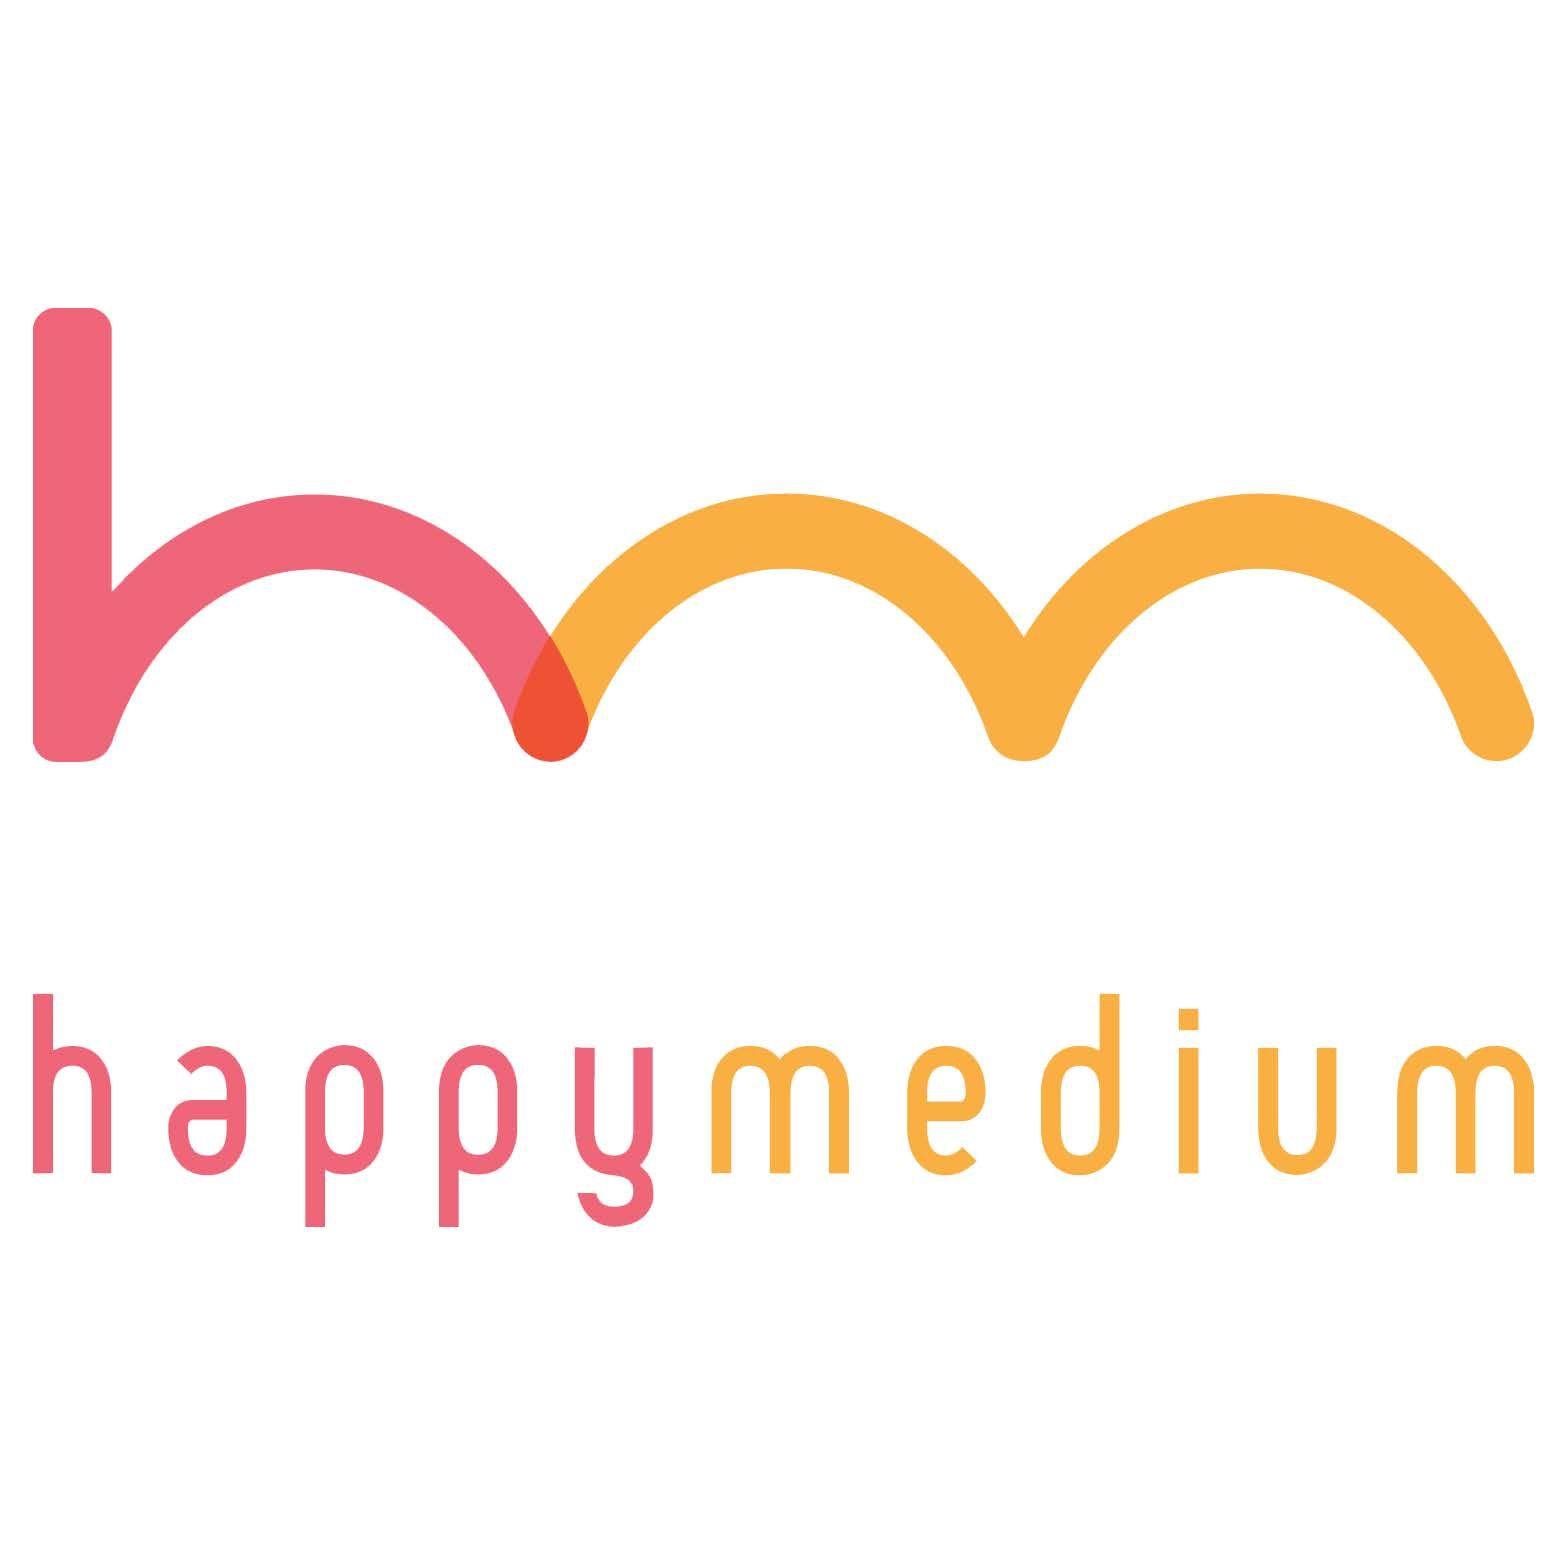 Happy Medium Des Moines Web Design Advertising Agency Digital Creative Agency Advertising Services Web Design